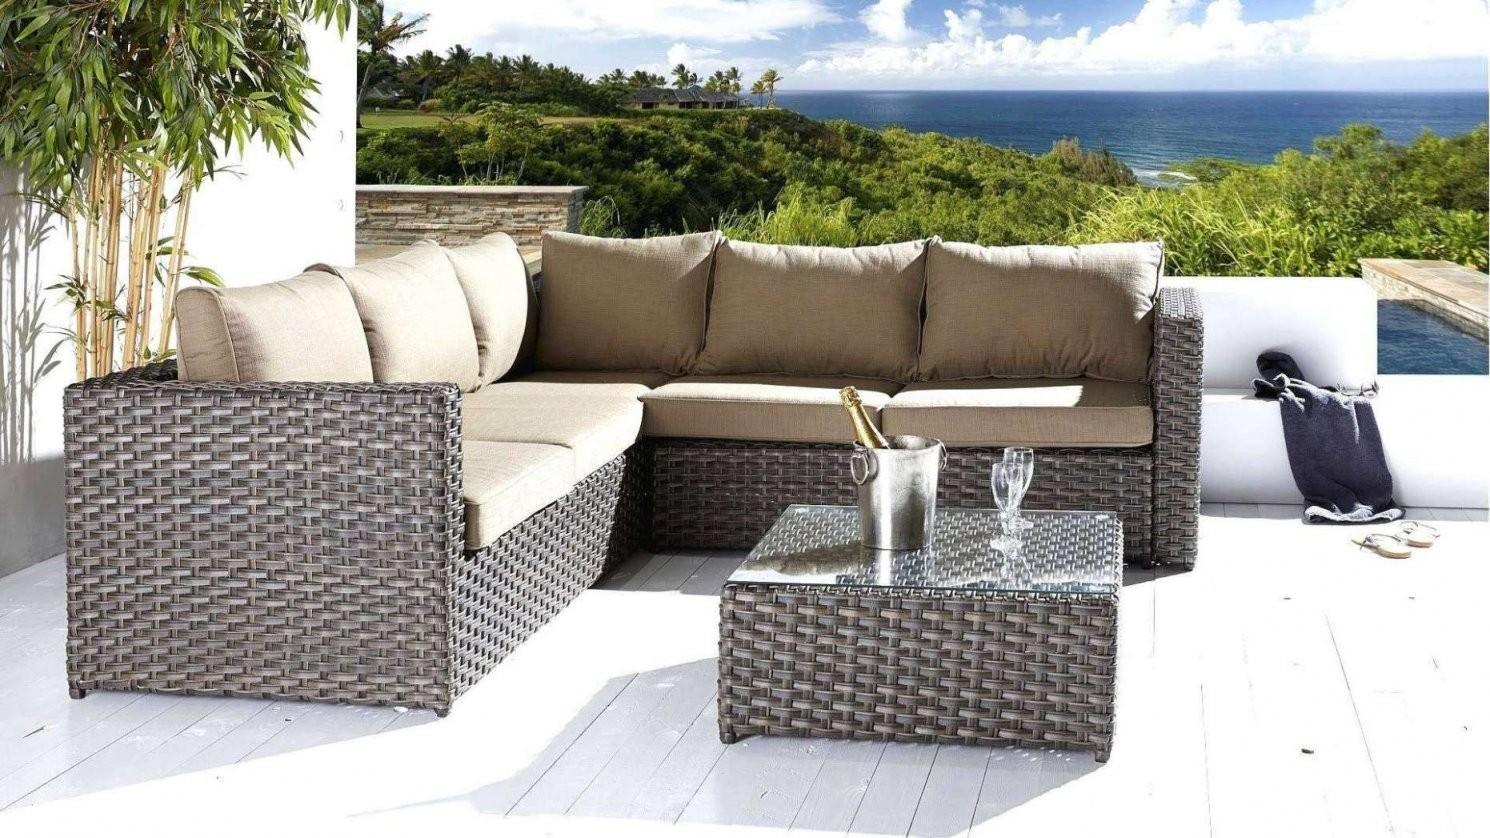 45 Elegant Gartenmöbel Selber Bauen Lounge Grafik  Vervollständigen von Lounge Möbel Selber Bauen Bild